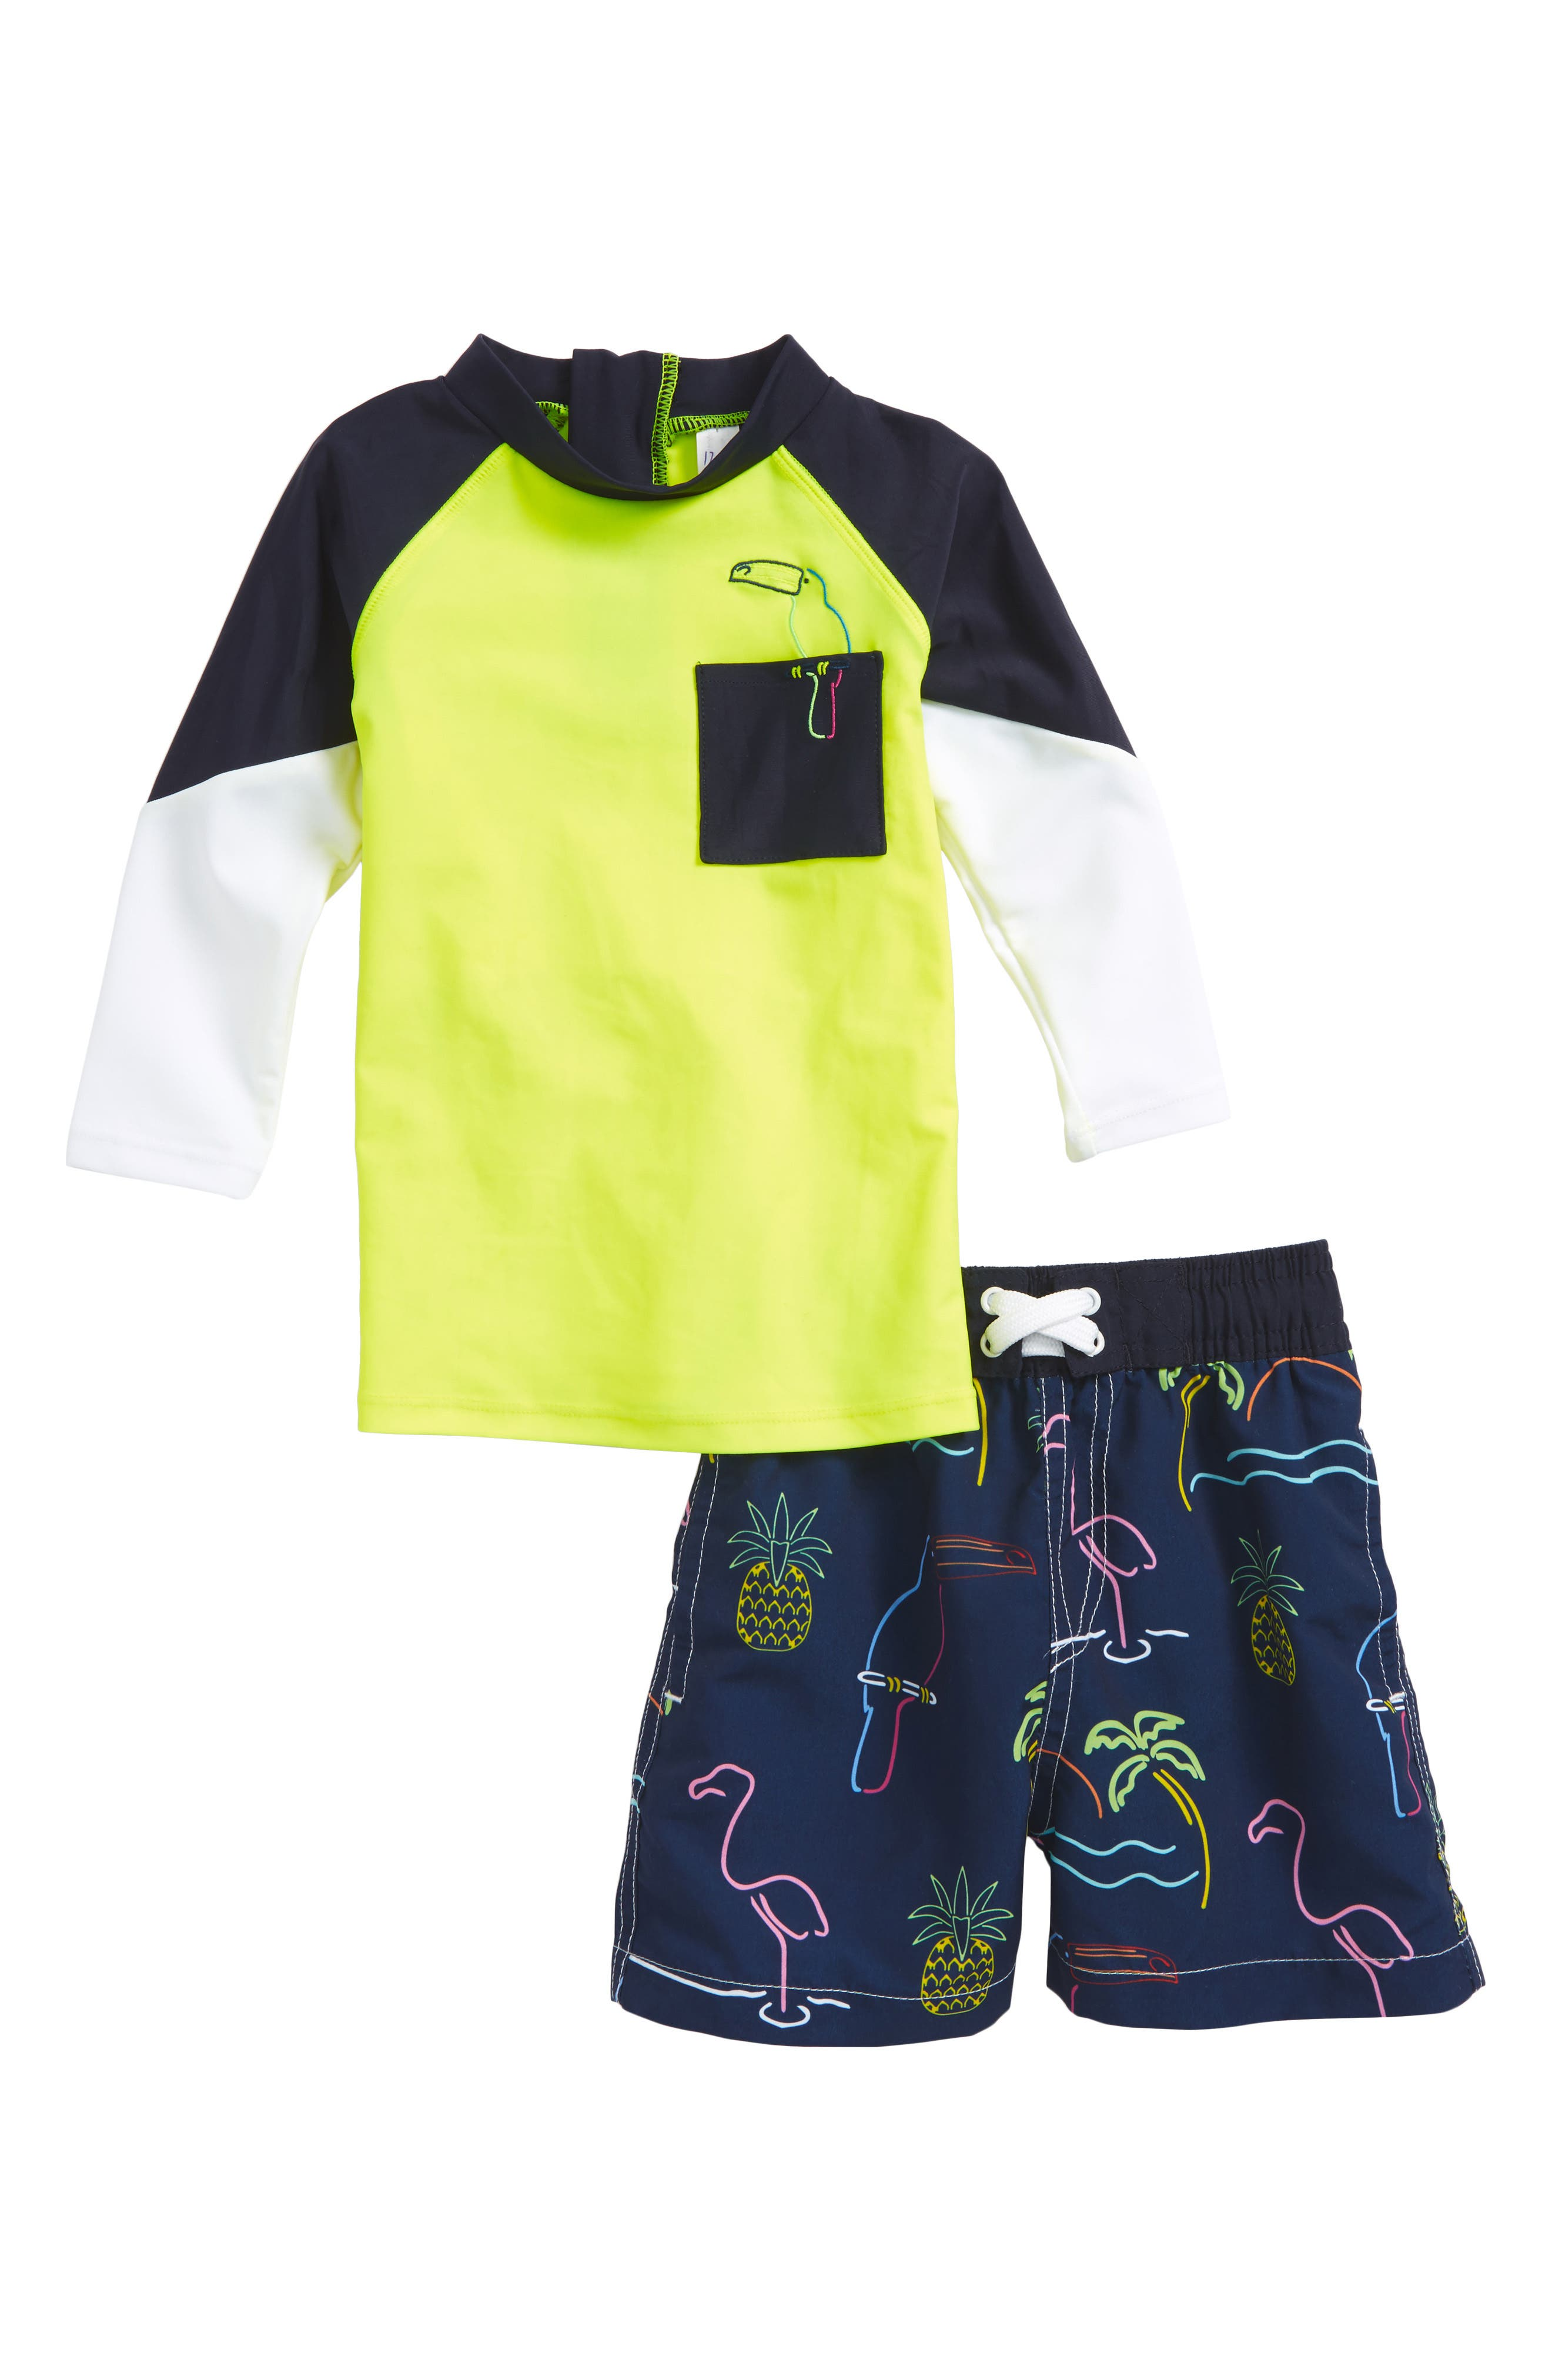 Main Image - Shade Critters Neon Sign Two-Piece Rashguard Swimsuit (Baby Boys)